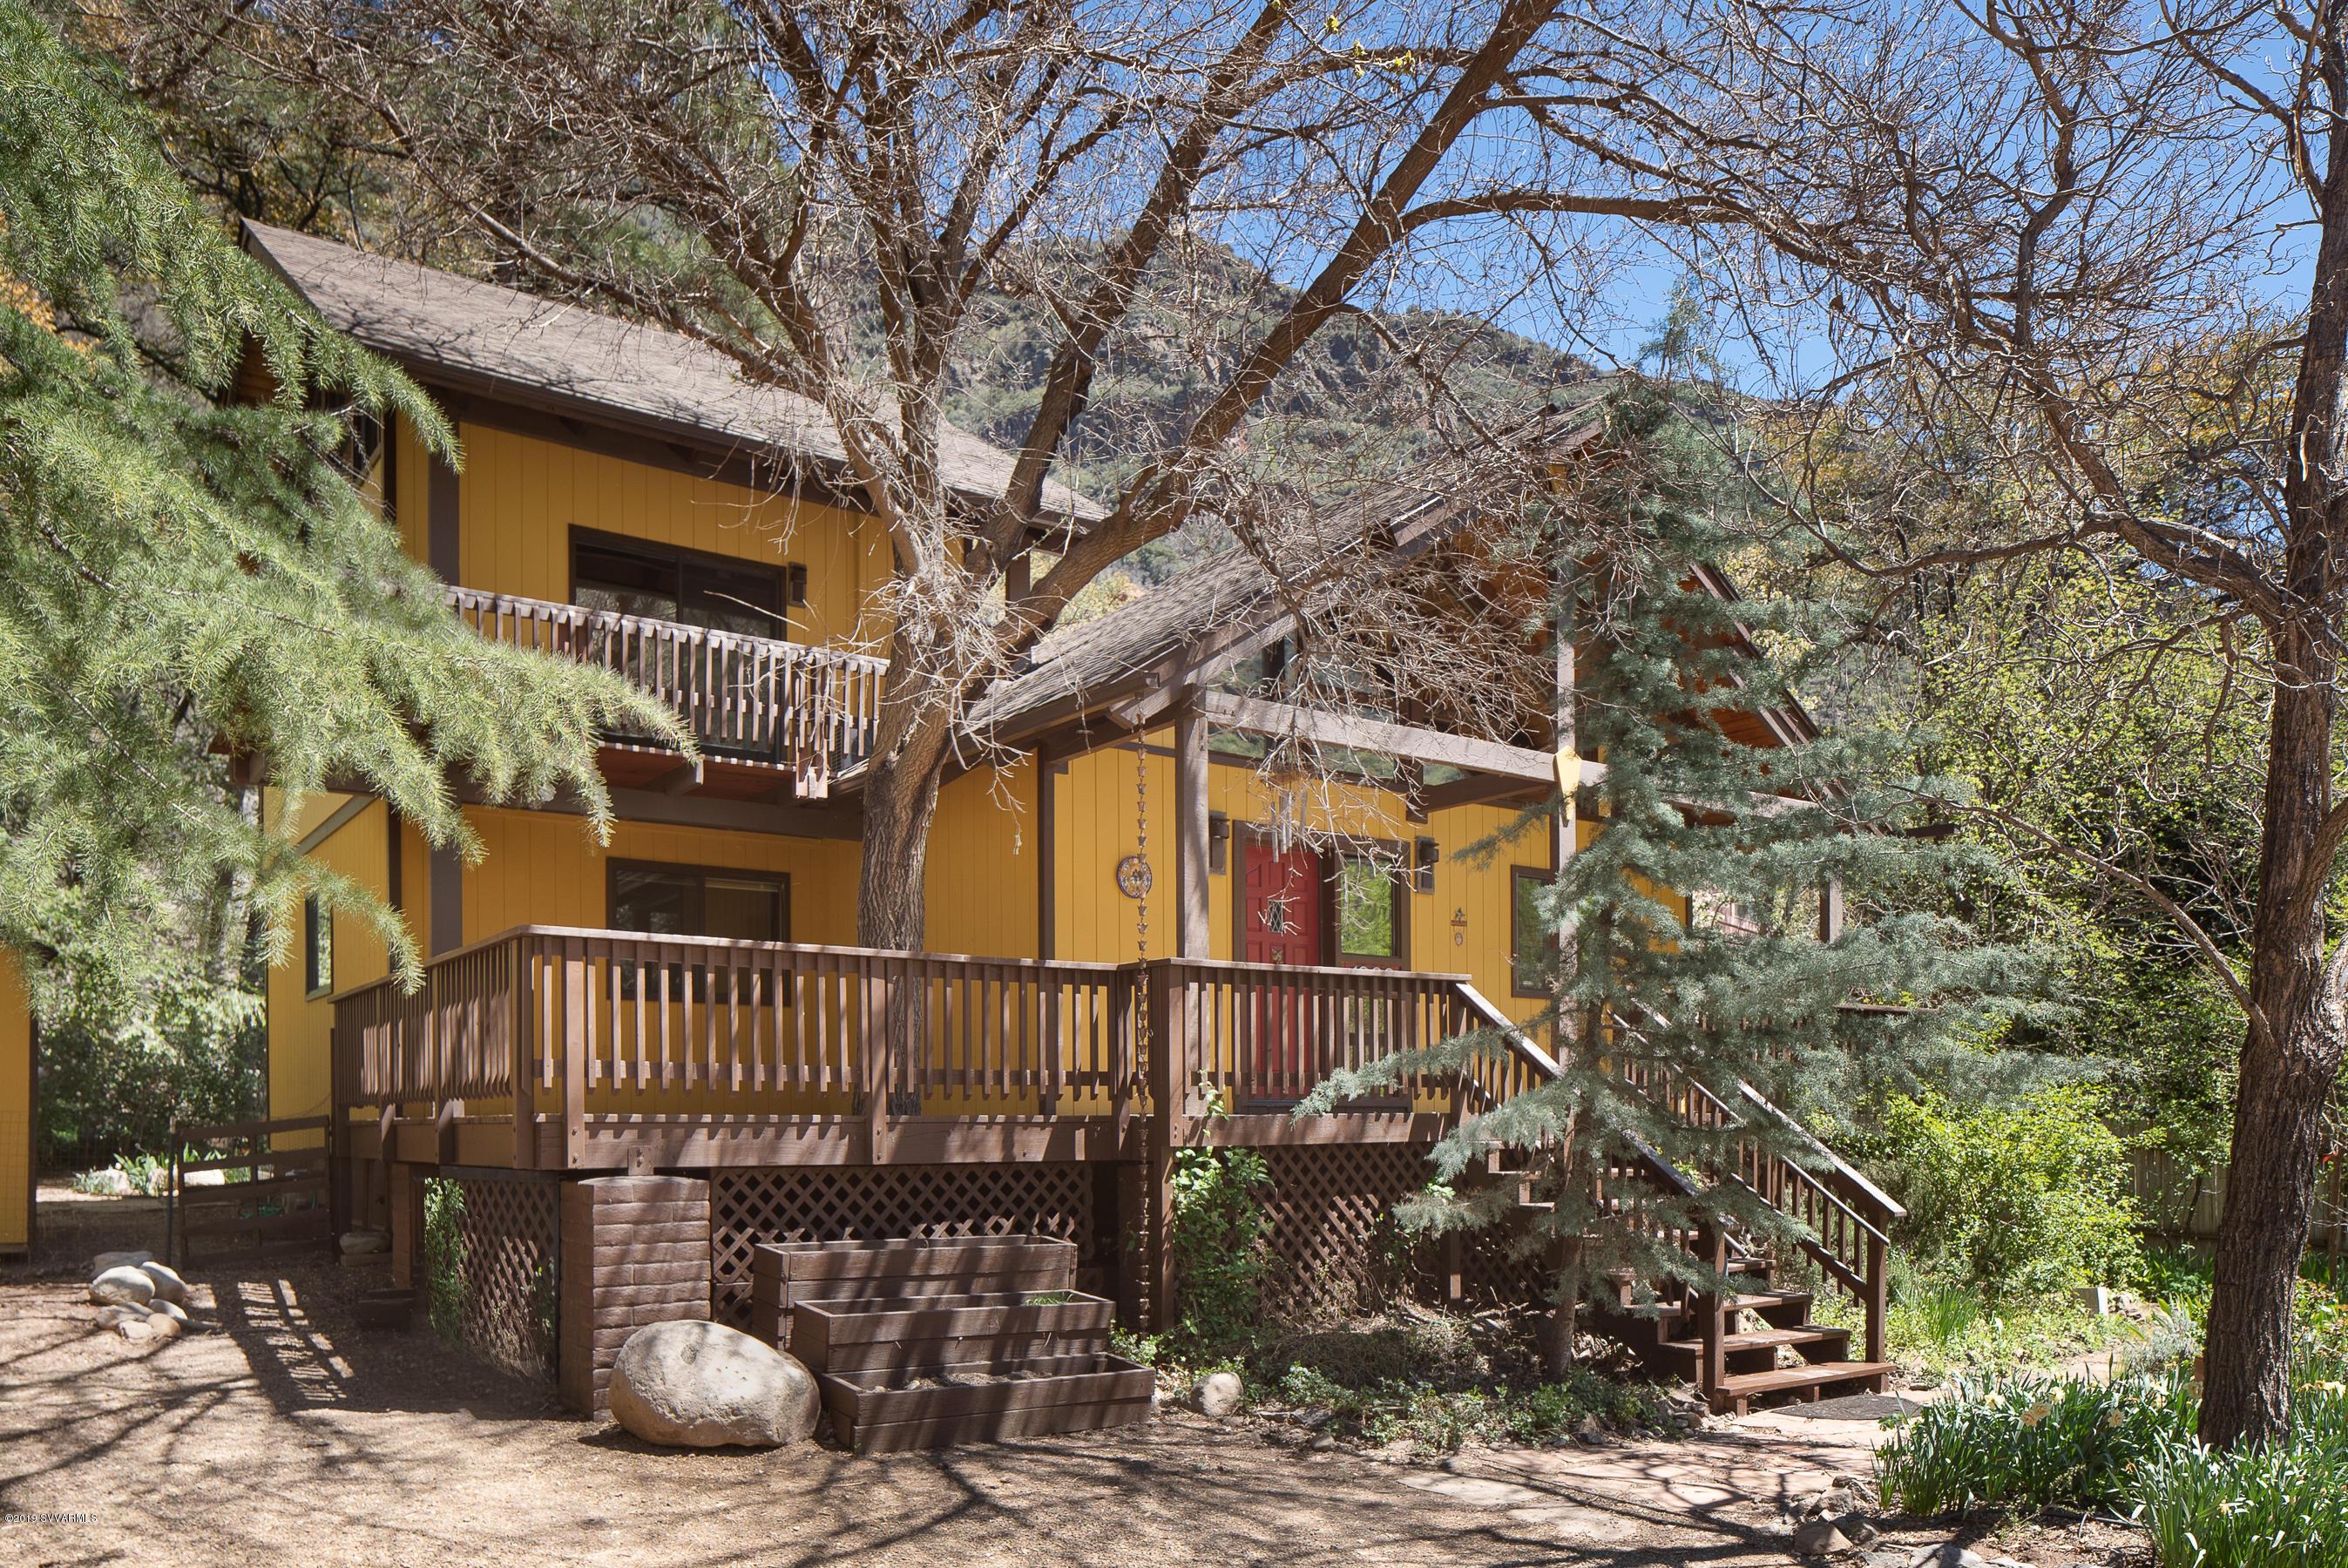 1000 Shangri La Sedona, AZ 86336